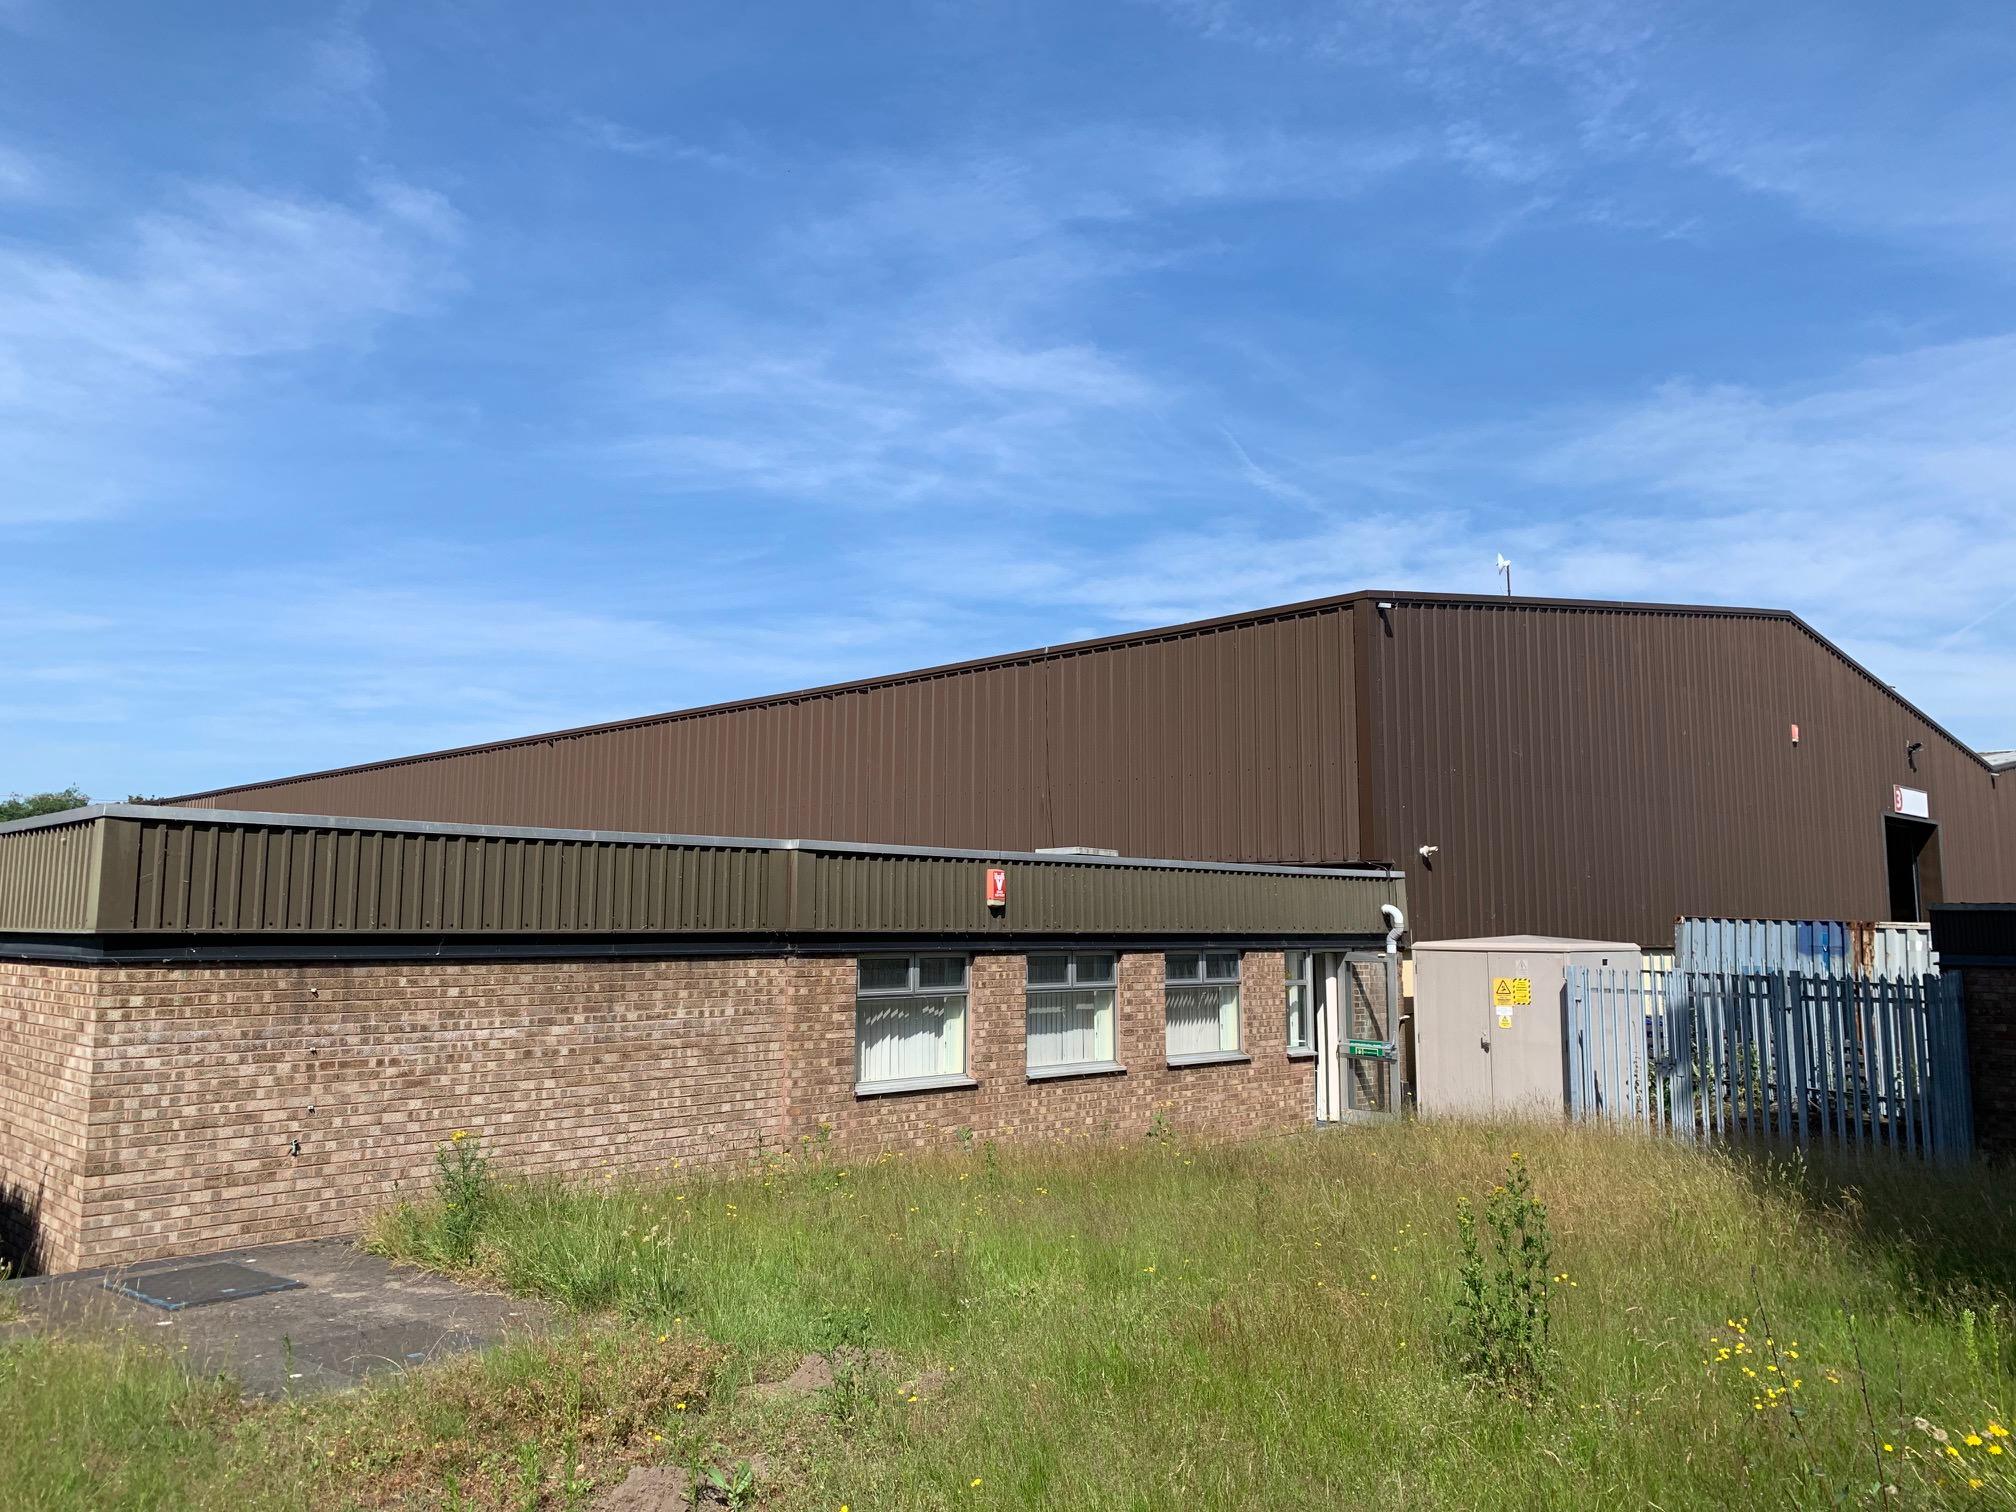 Unit 3 - Cherwell Enterprise Park, Hortonwood 2, Telford, Shropshire, TF1 7GW